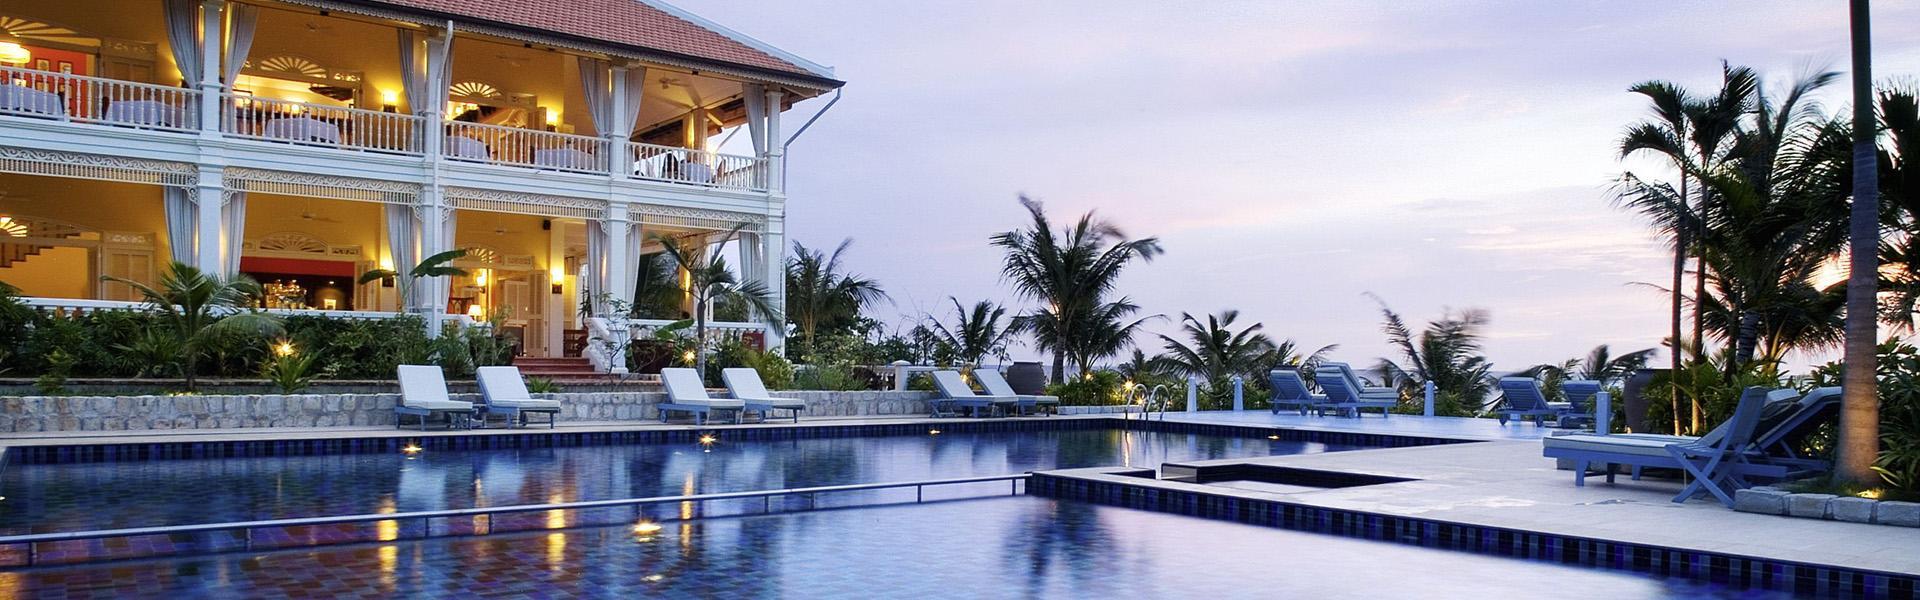 La Veranda Resort Phu Quoc MGallery by Sofitel 5*